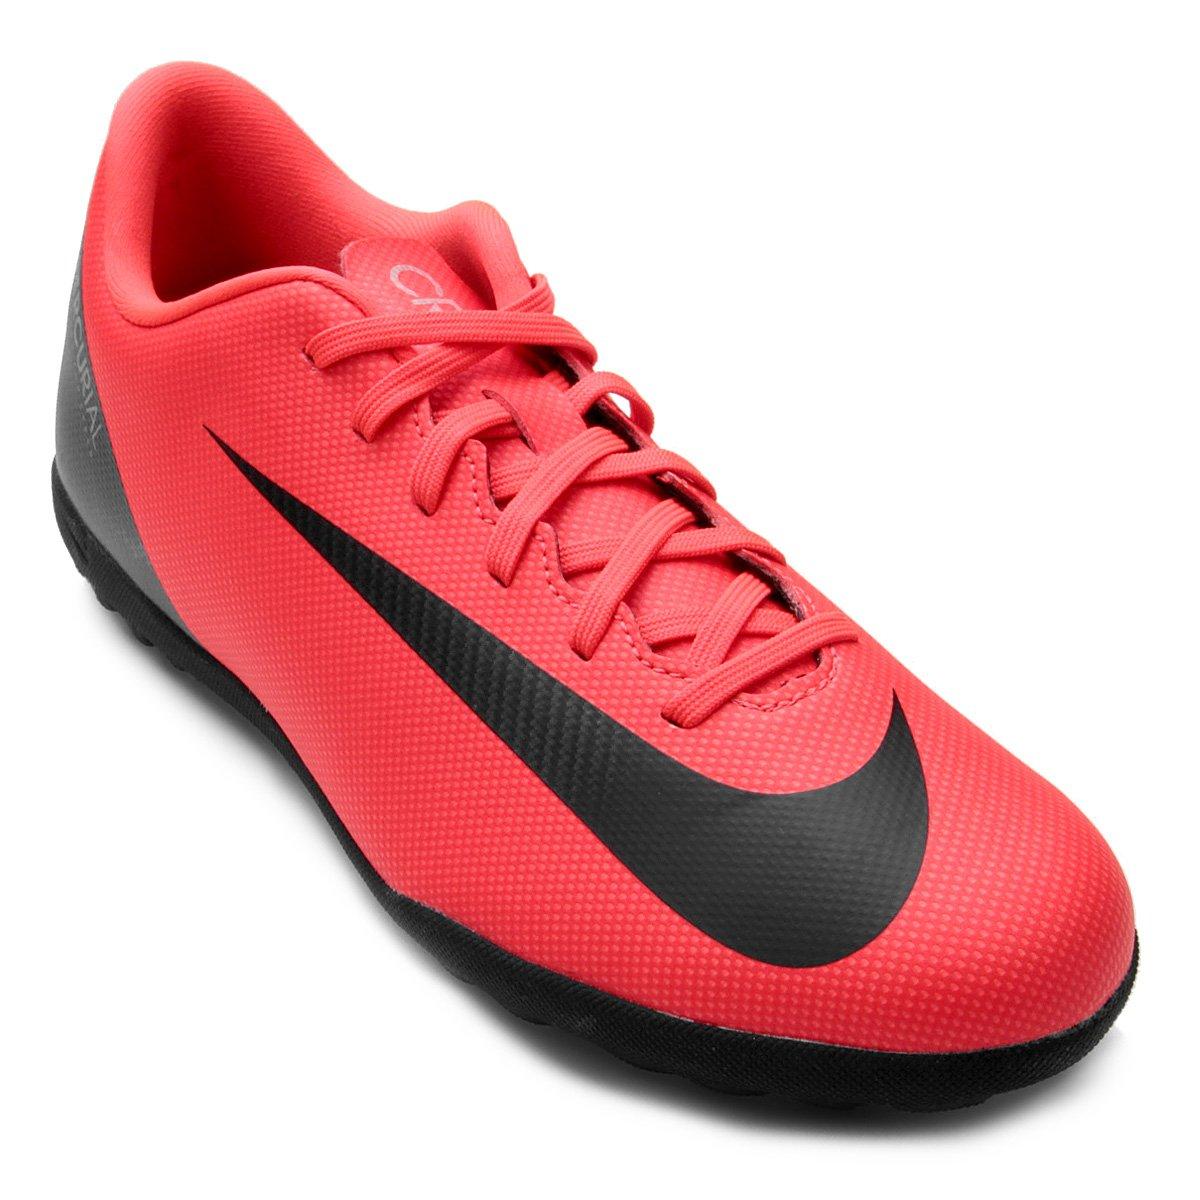 93edc5b4b210f Chuteira Society Nike Mercurial Vapor 12 Club CR7 TF | Shop Timão